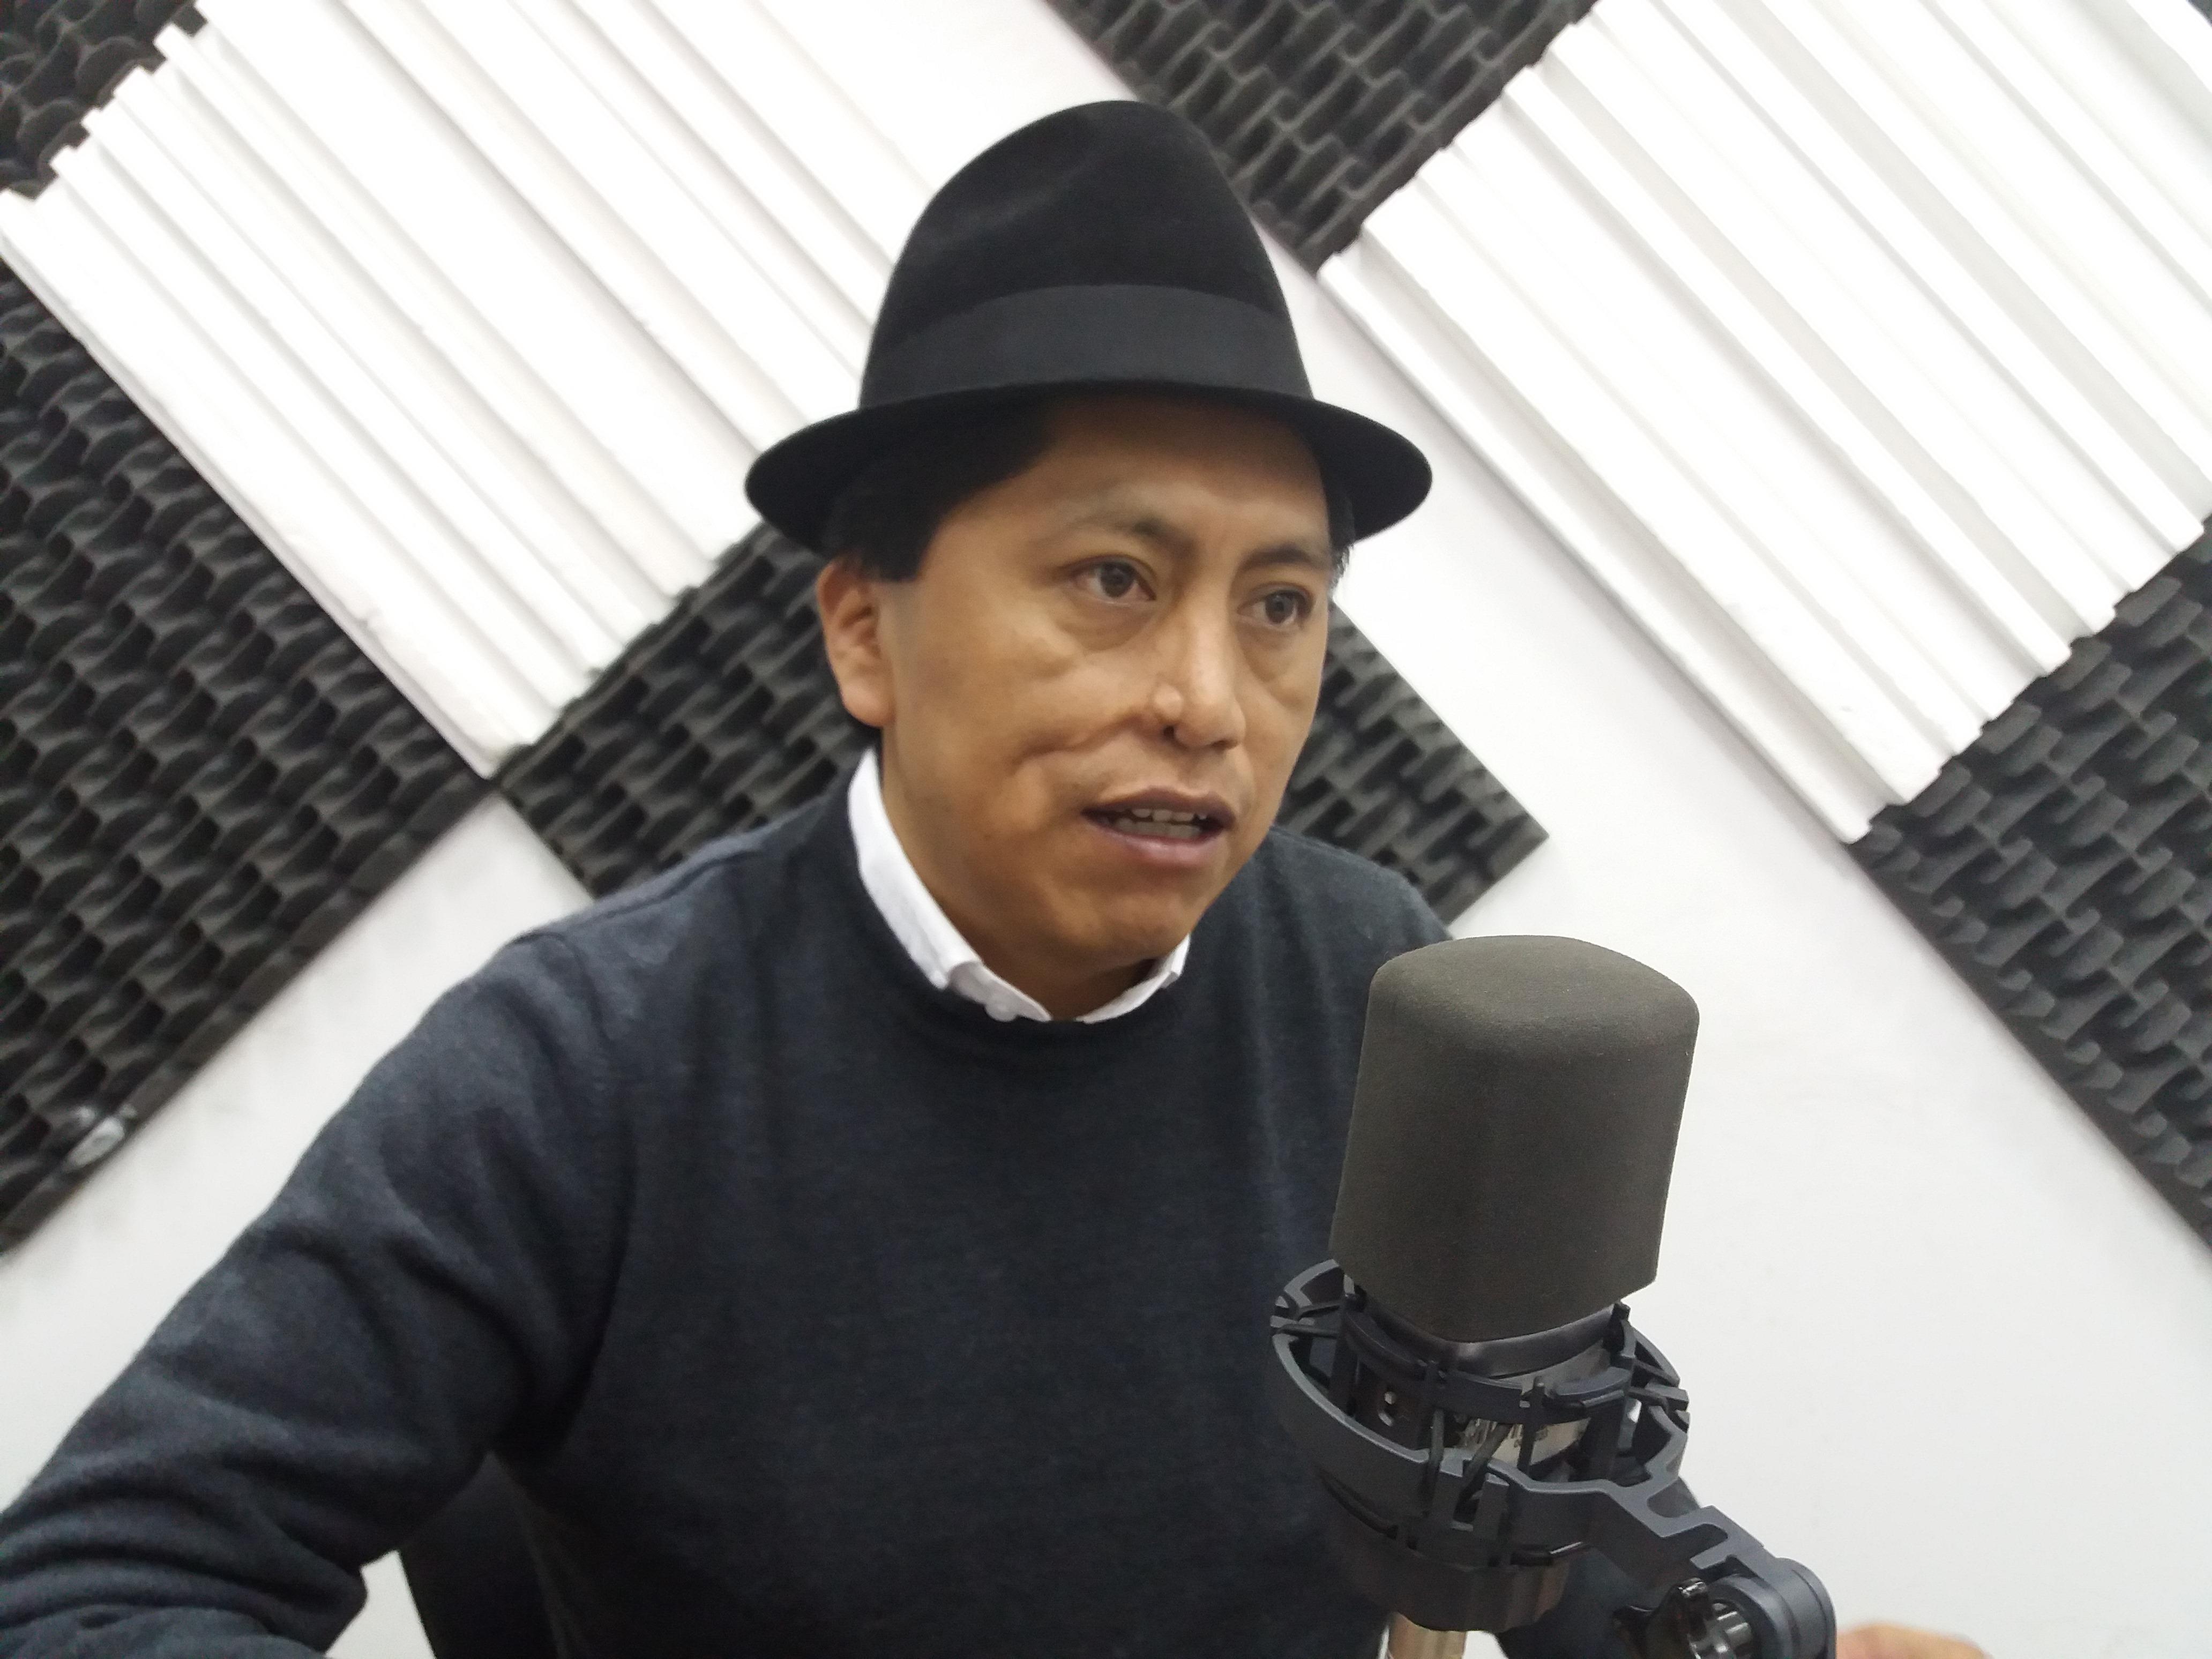 Humberto Cholango: Diálogo con resultados